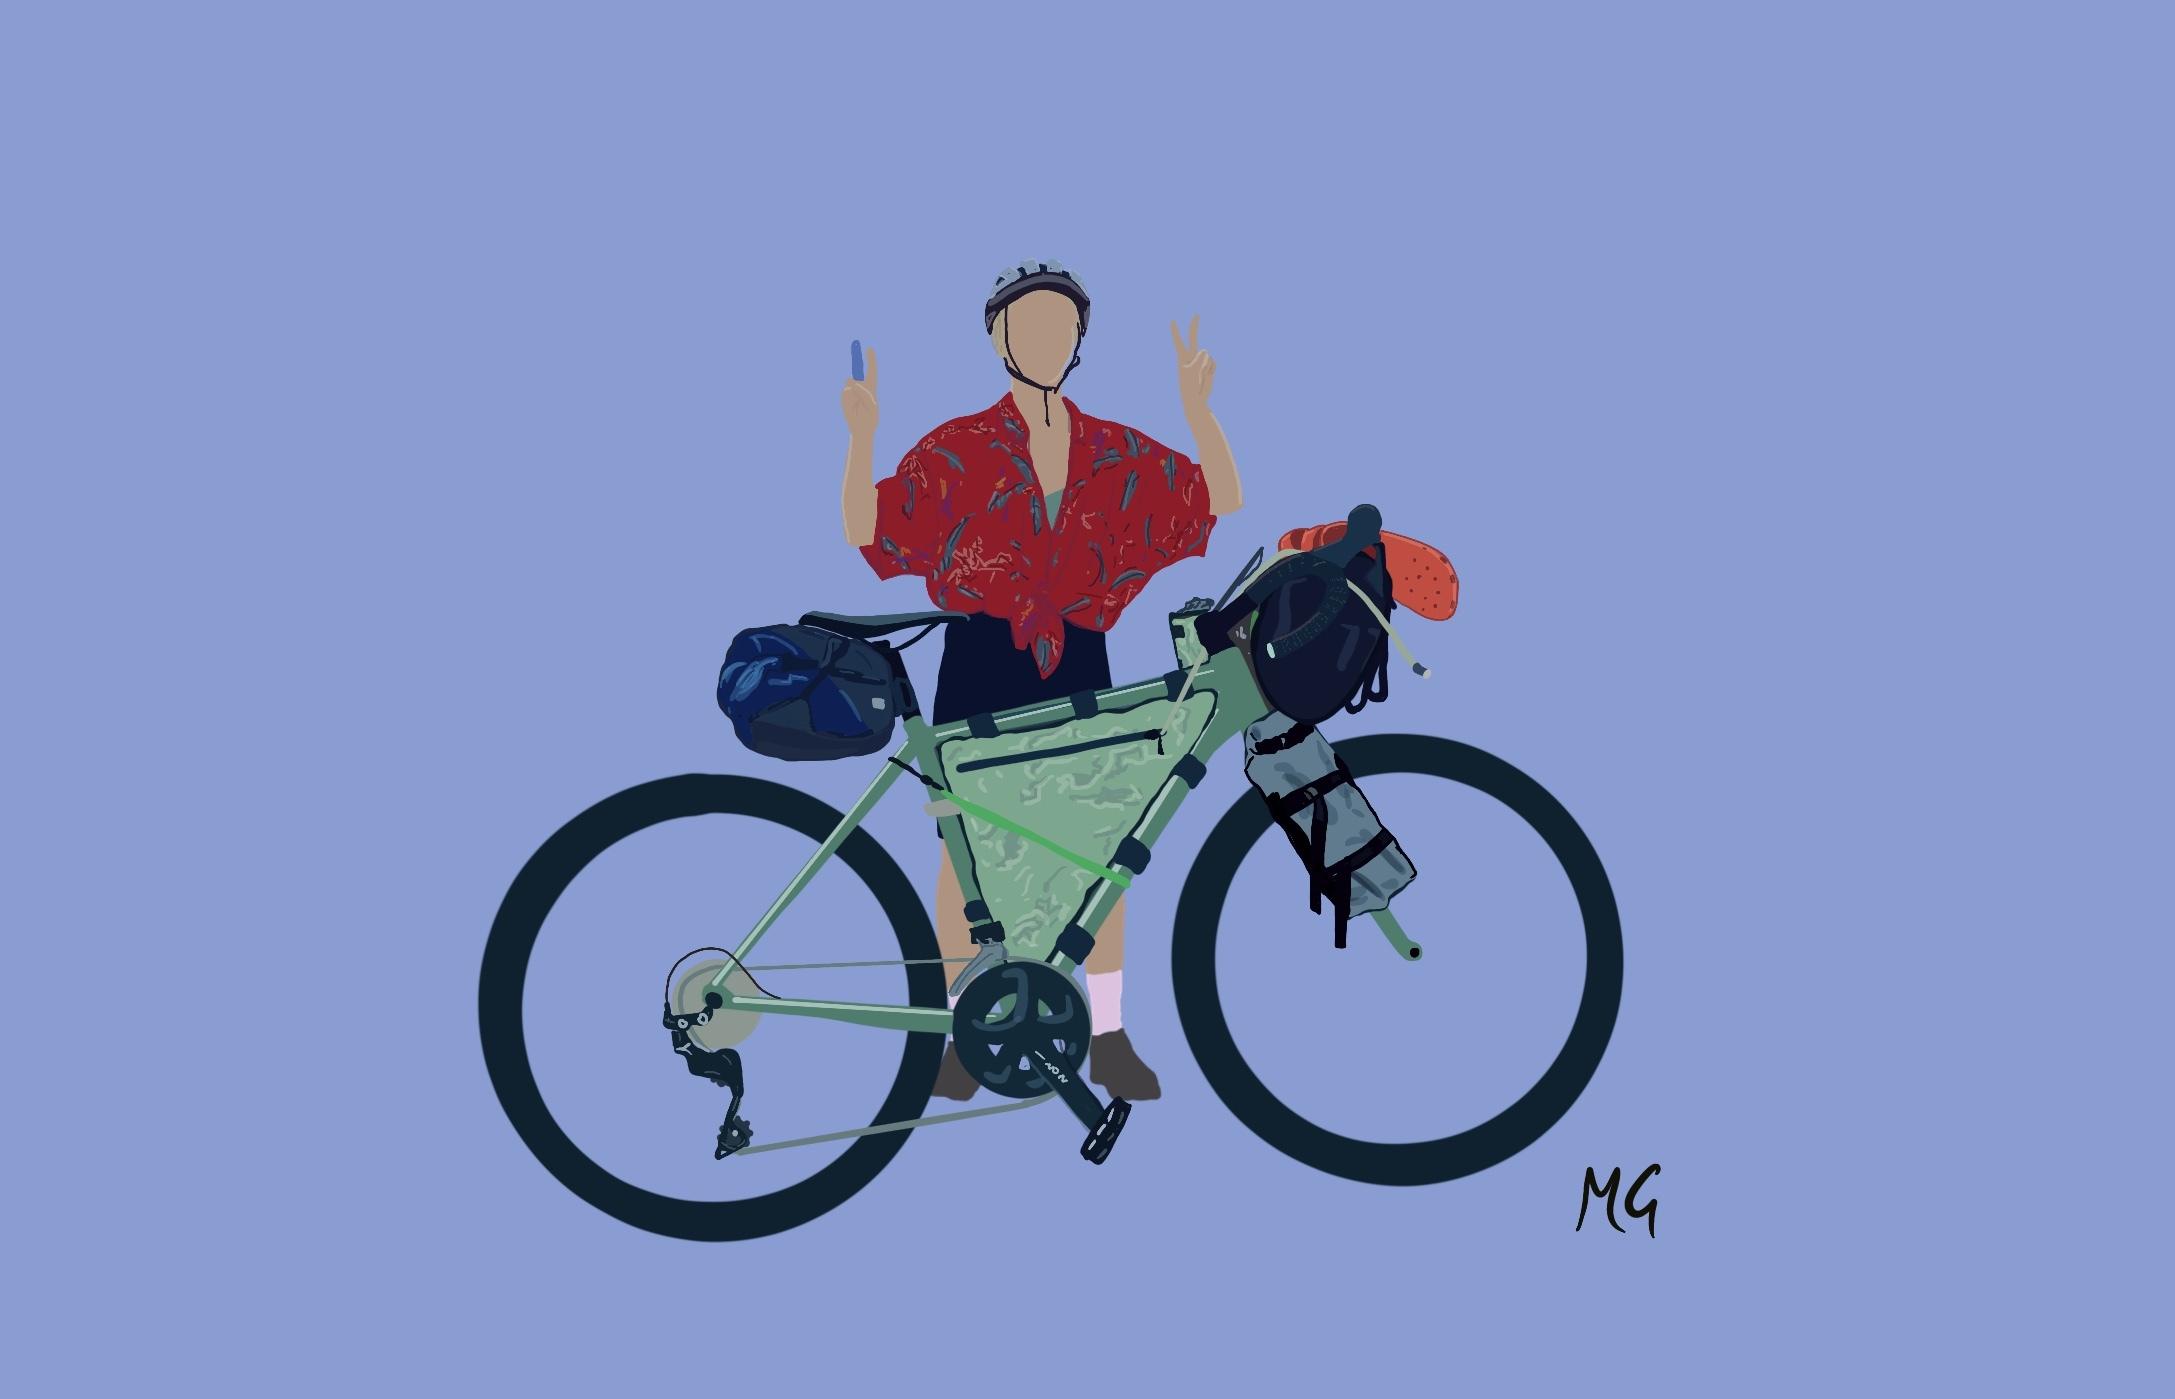 @Mattiedrawsbikes Mattie draws bikes bikepacking illustrations using procreate